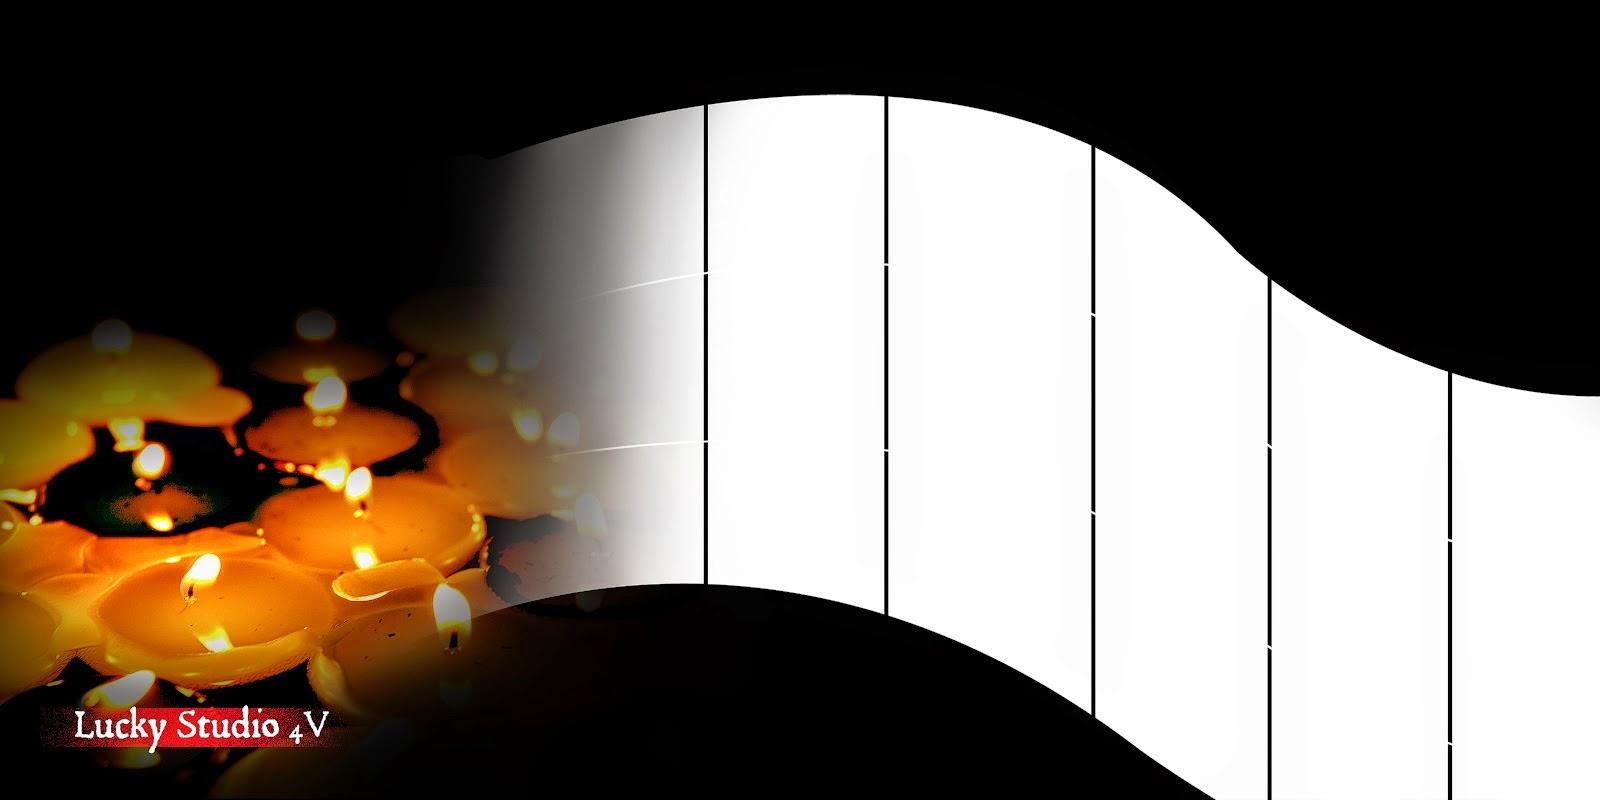 10 Beautiful Karizma Album Background Studiopk